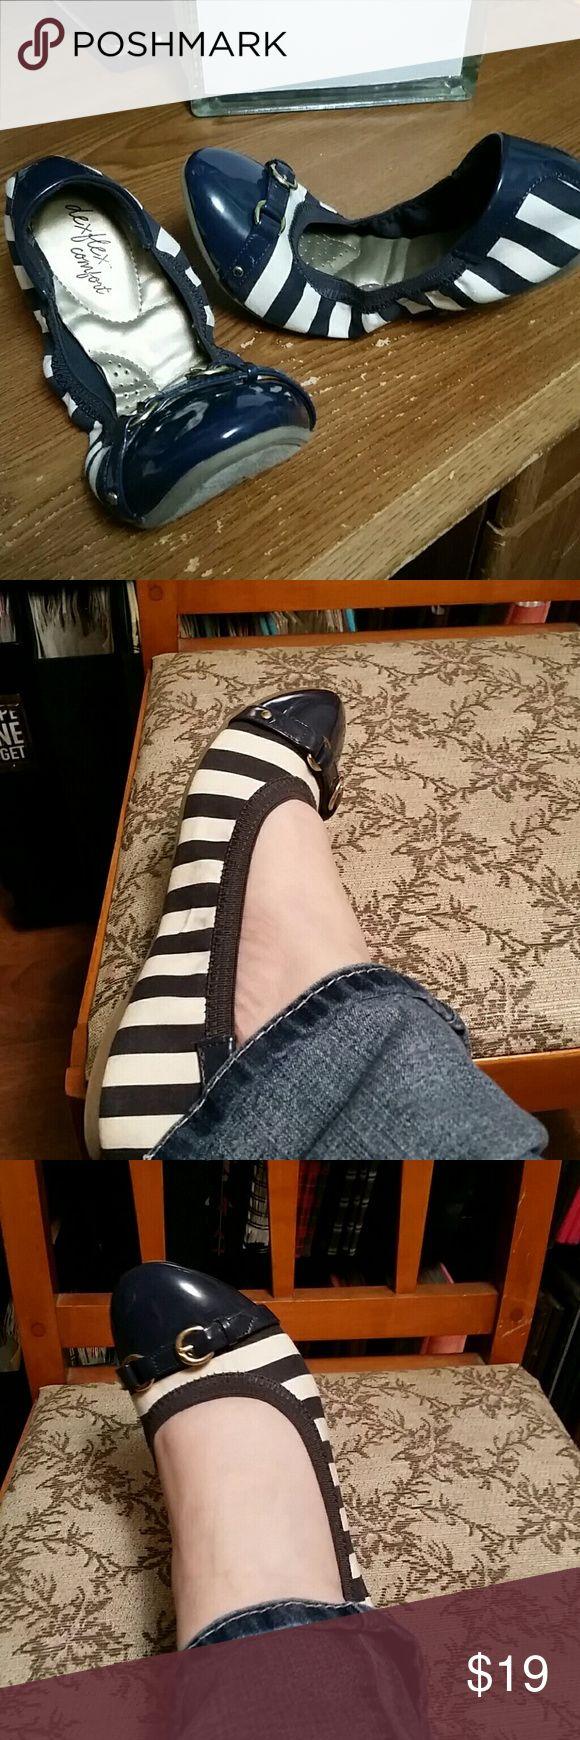 Navy Blue and White flats Navy Blue and White flats dexflex comfort Shoes Flats & Loafers